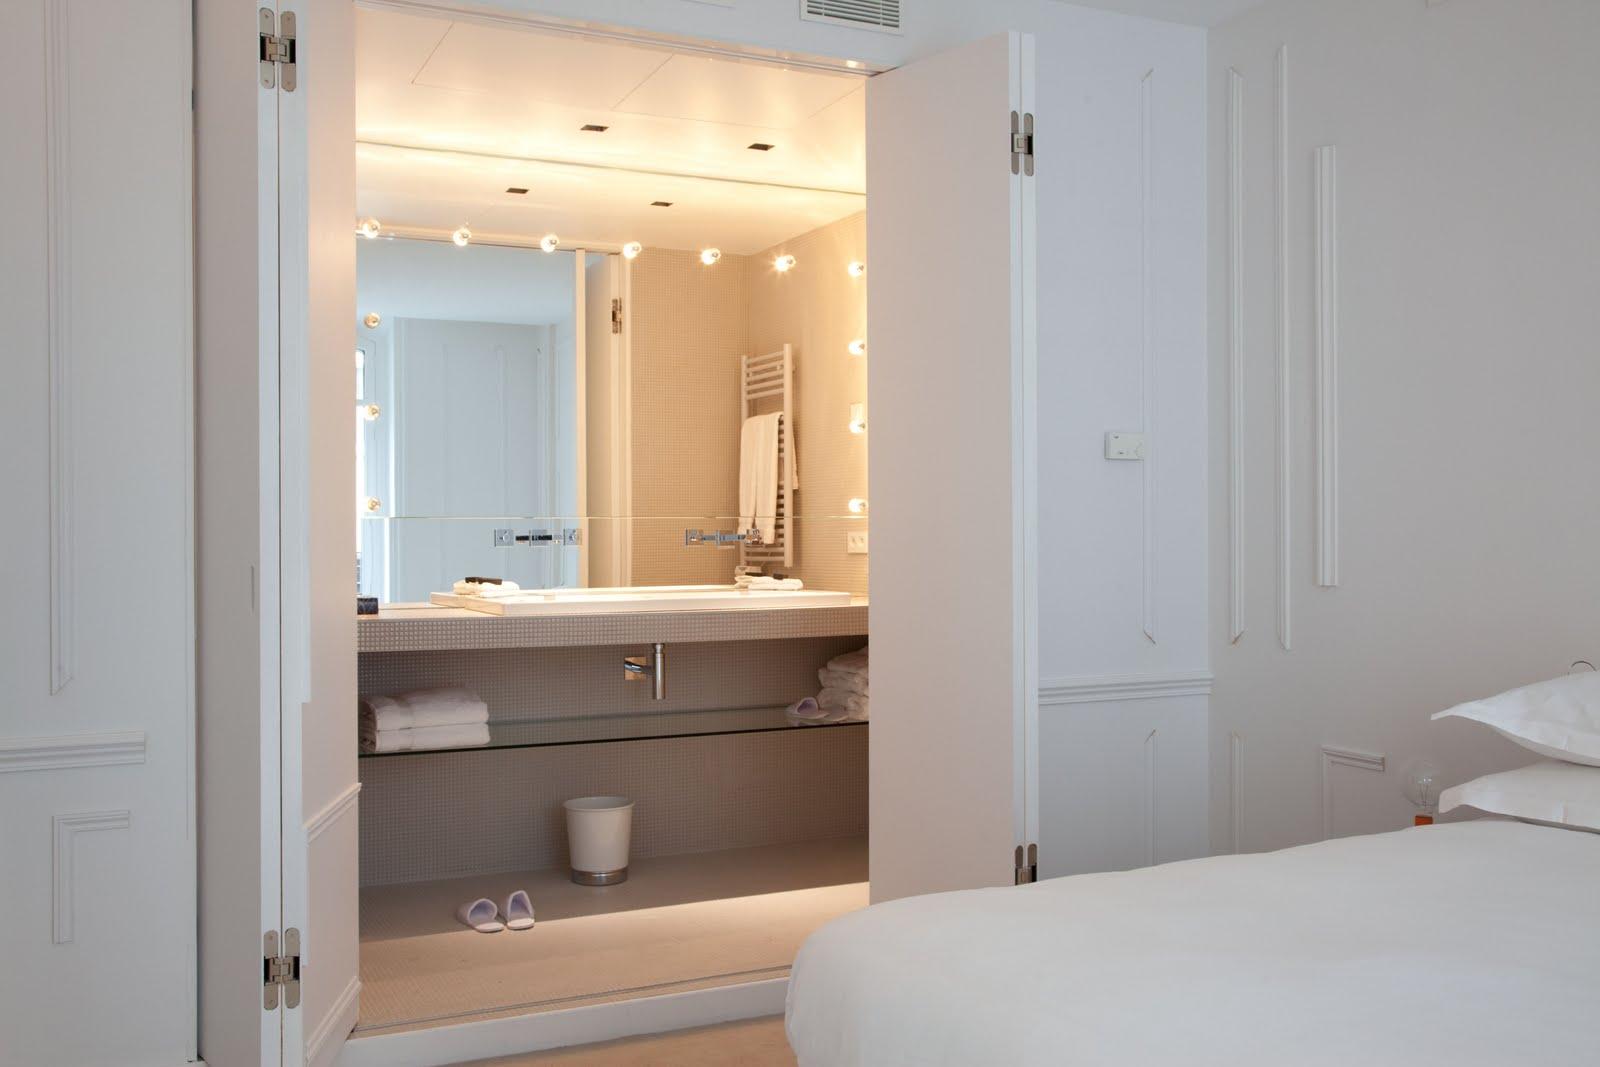 Maison-Martin-Margiela-Hotel-La-Maison-Champs-Elysees-5